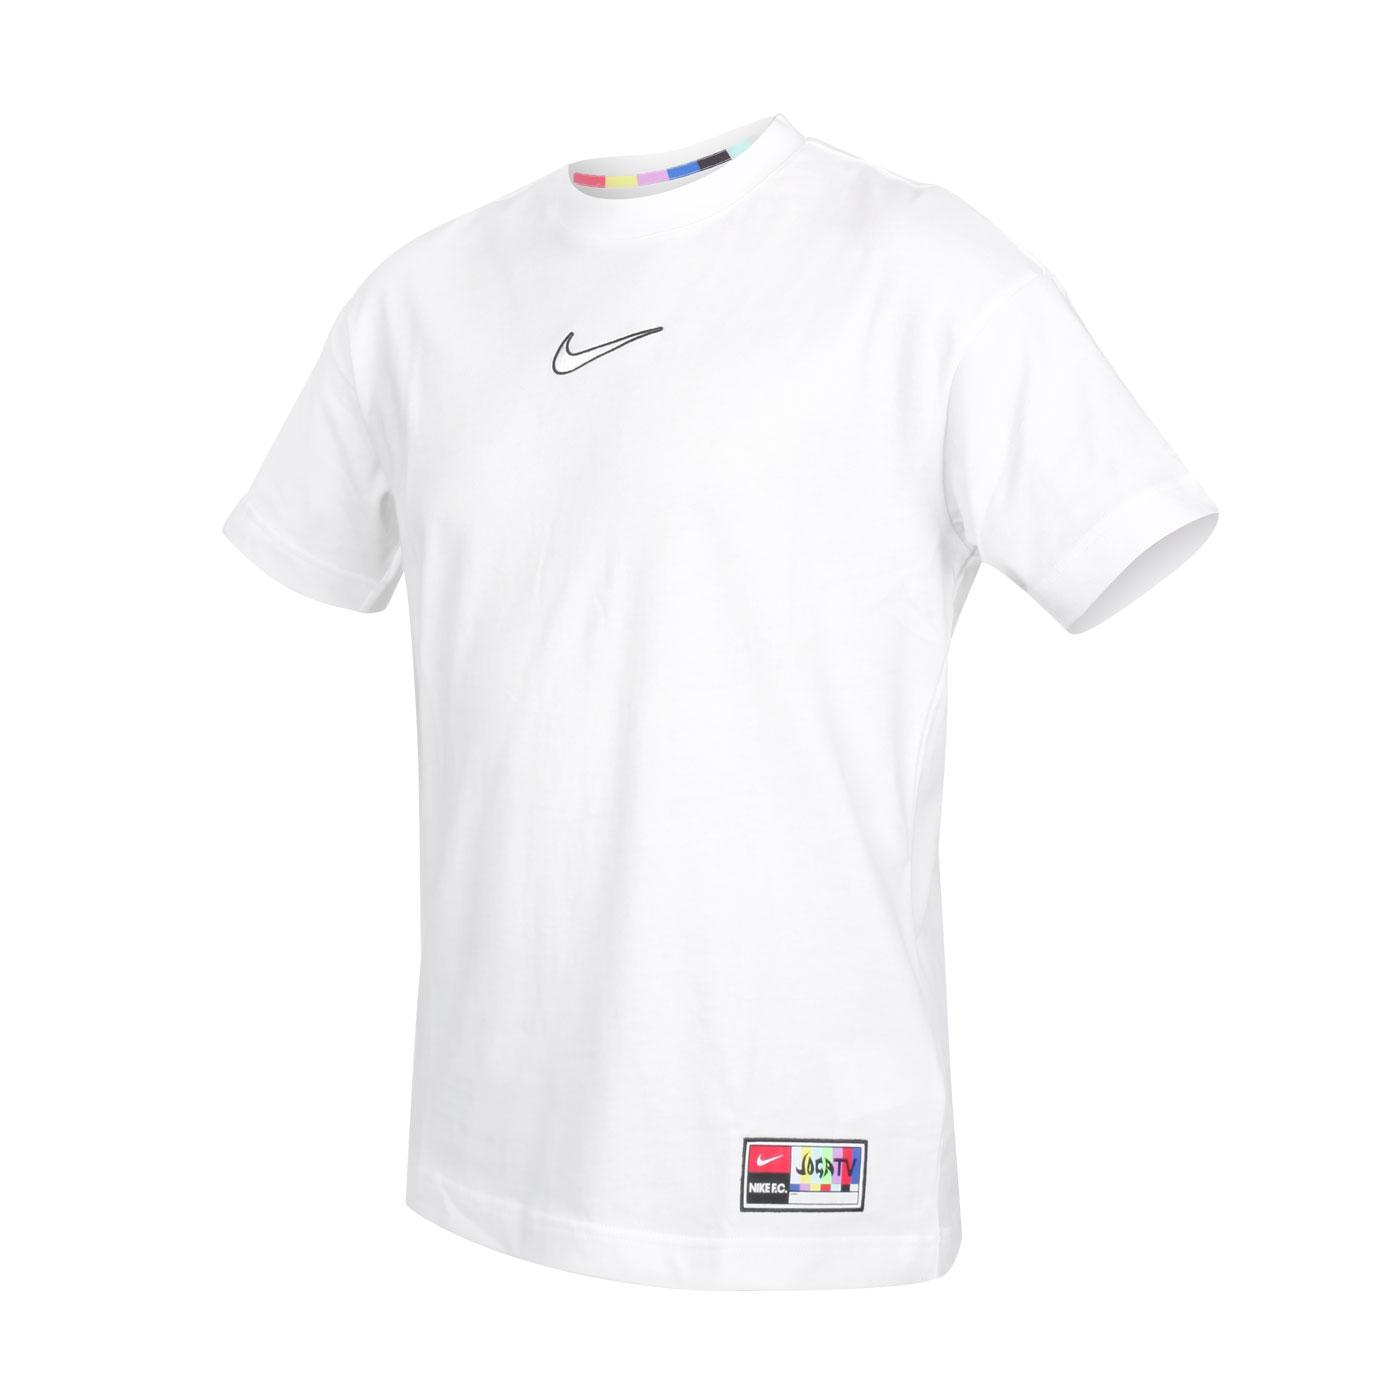 NIKE 男款短袖T恤 CZ1010-100